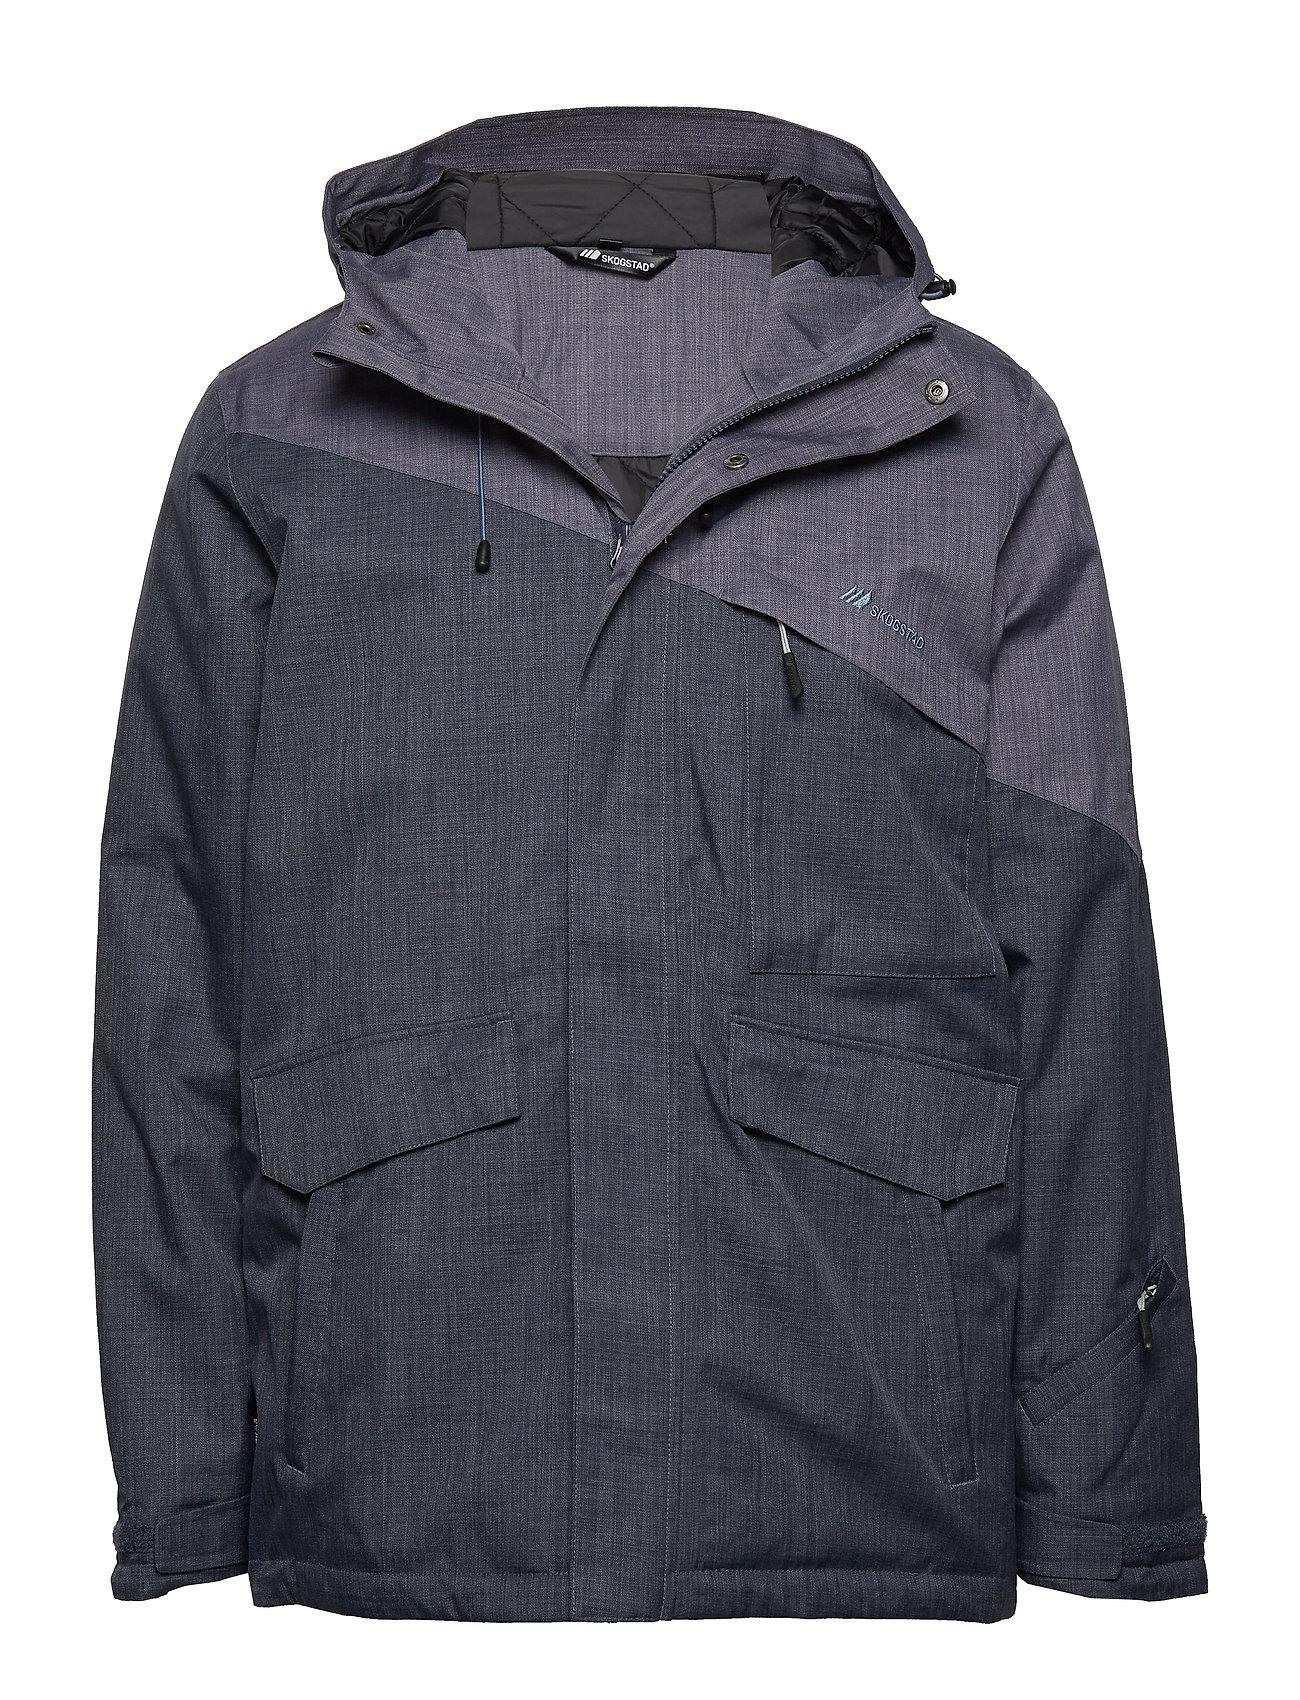 Skogstad Holsen 2-Layer Techincal Jacket - STEEL